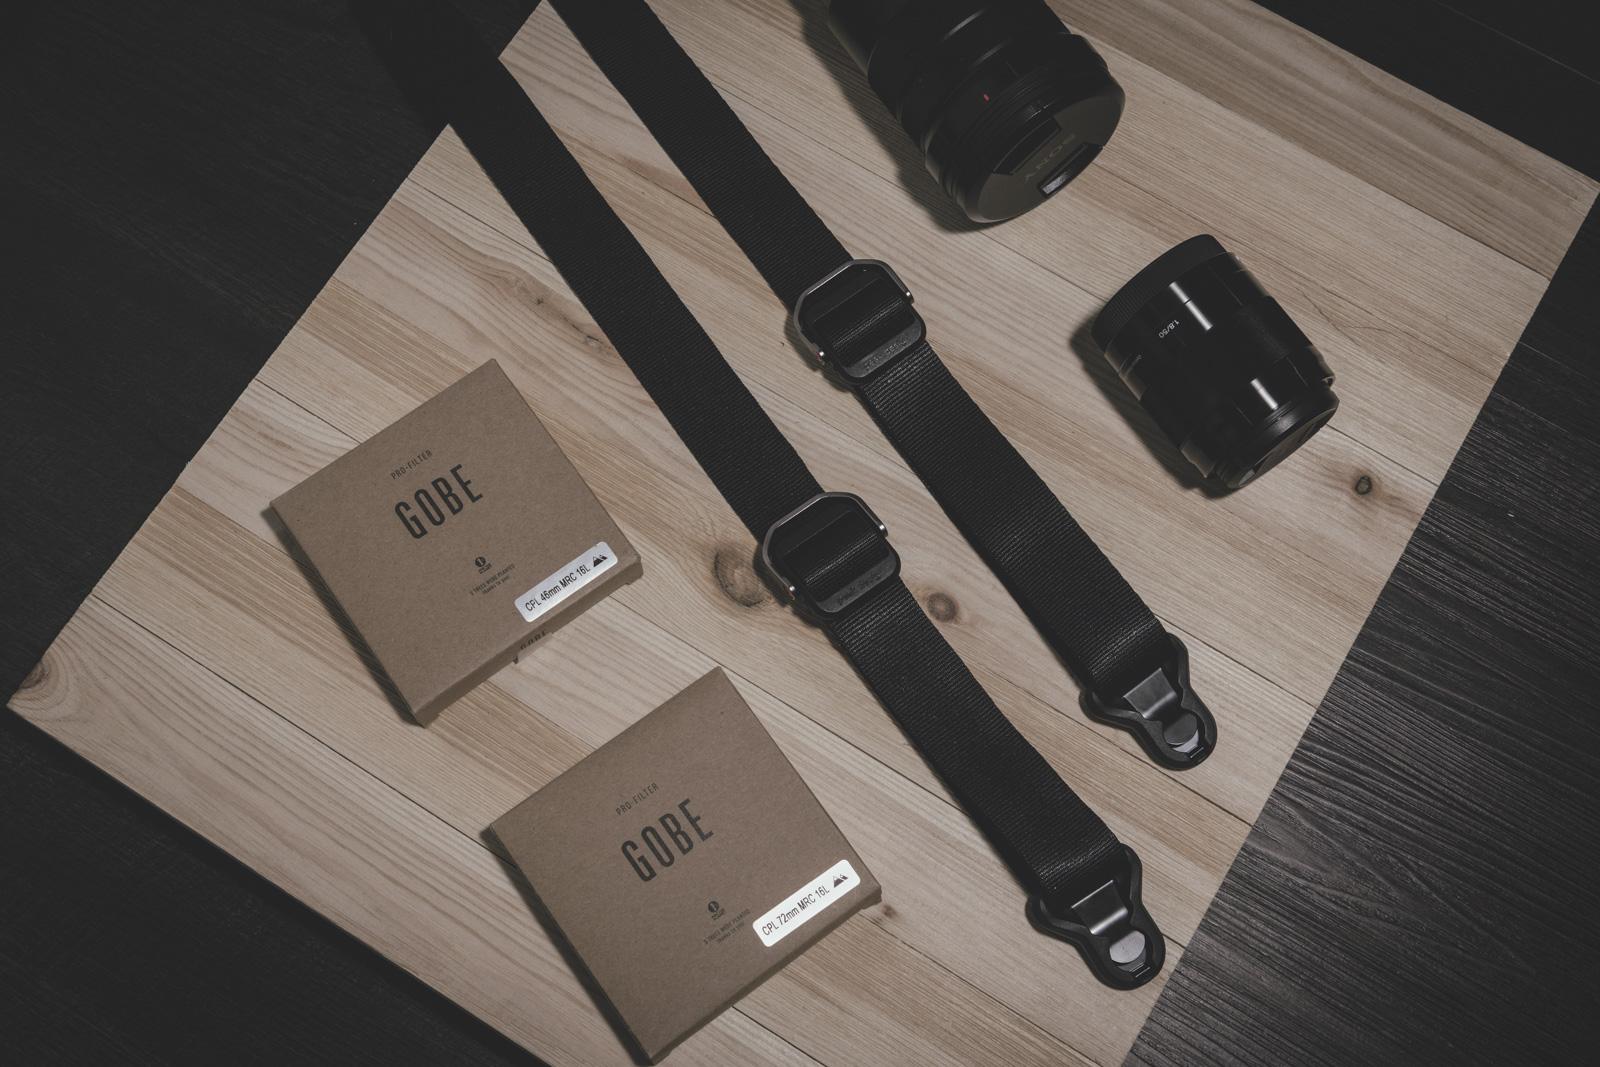 camera-gear-photography-reviews_9